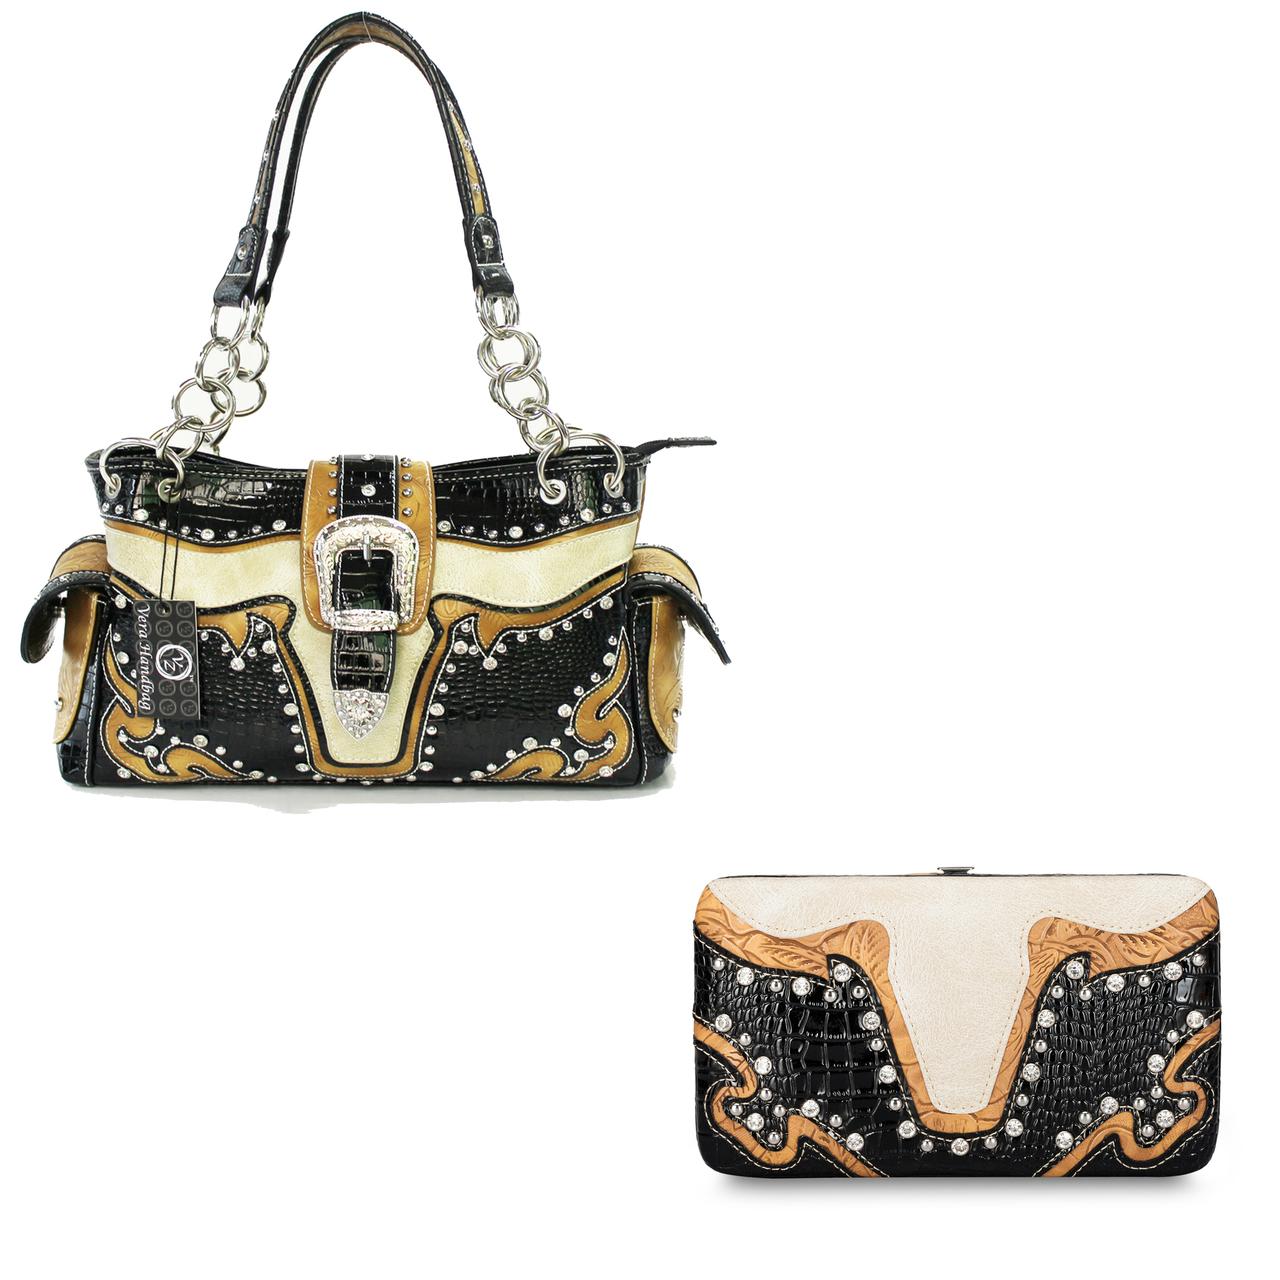 Western Conceal Carry Handbag